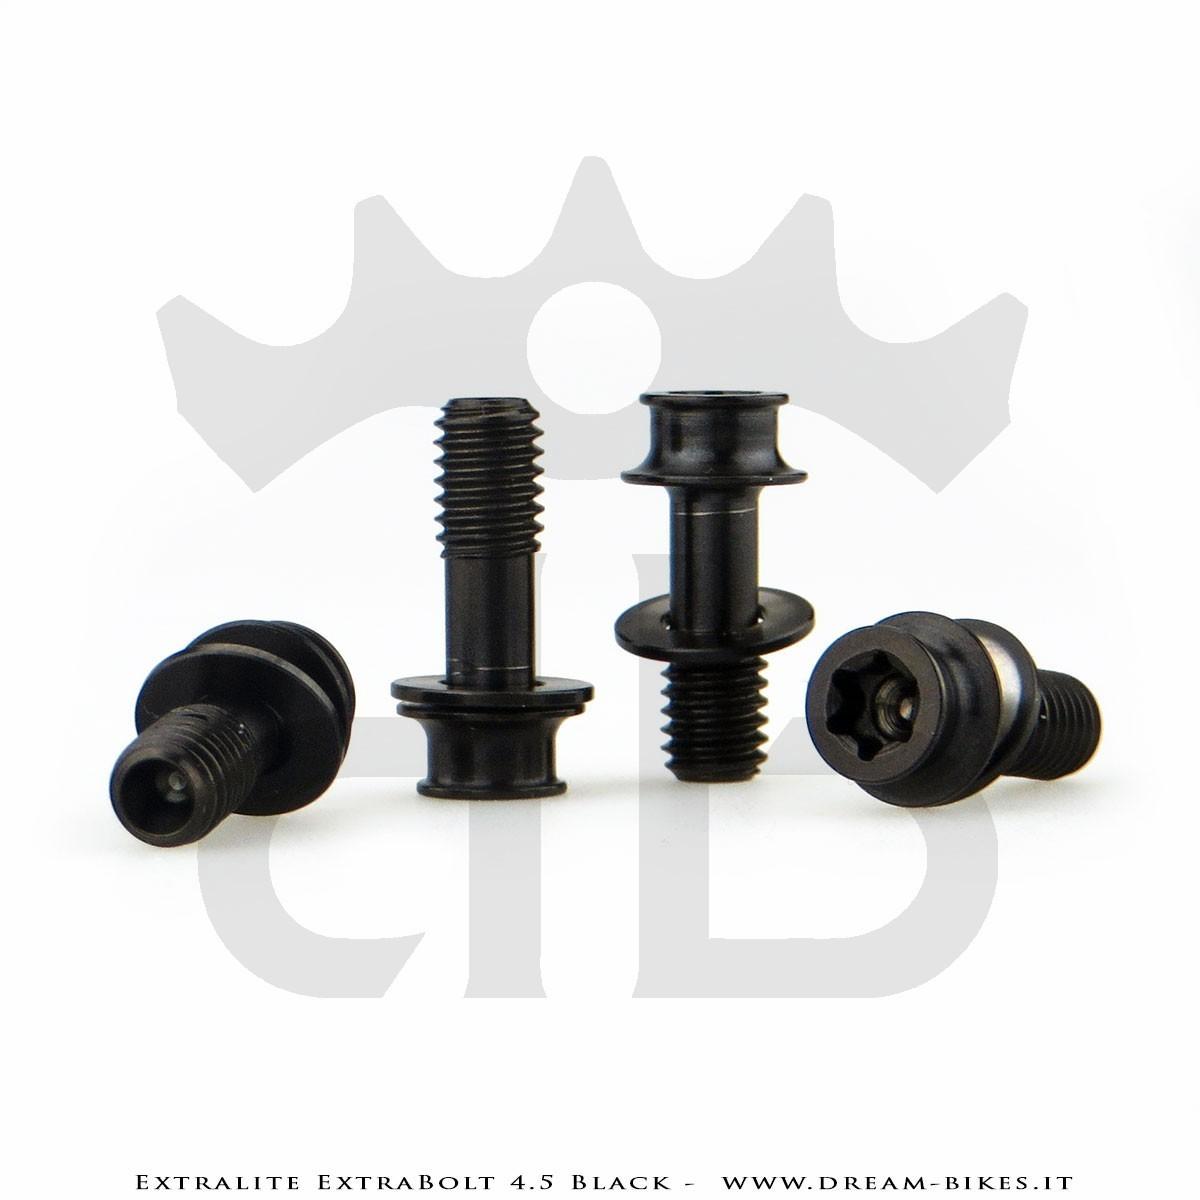 Extralite ExtraBolt 4.5 Brake Caliper Titanium Bolts Black